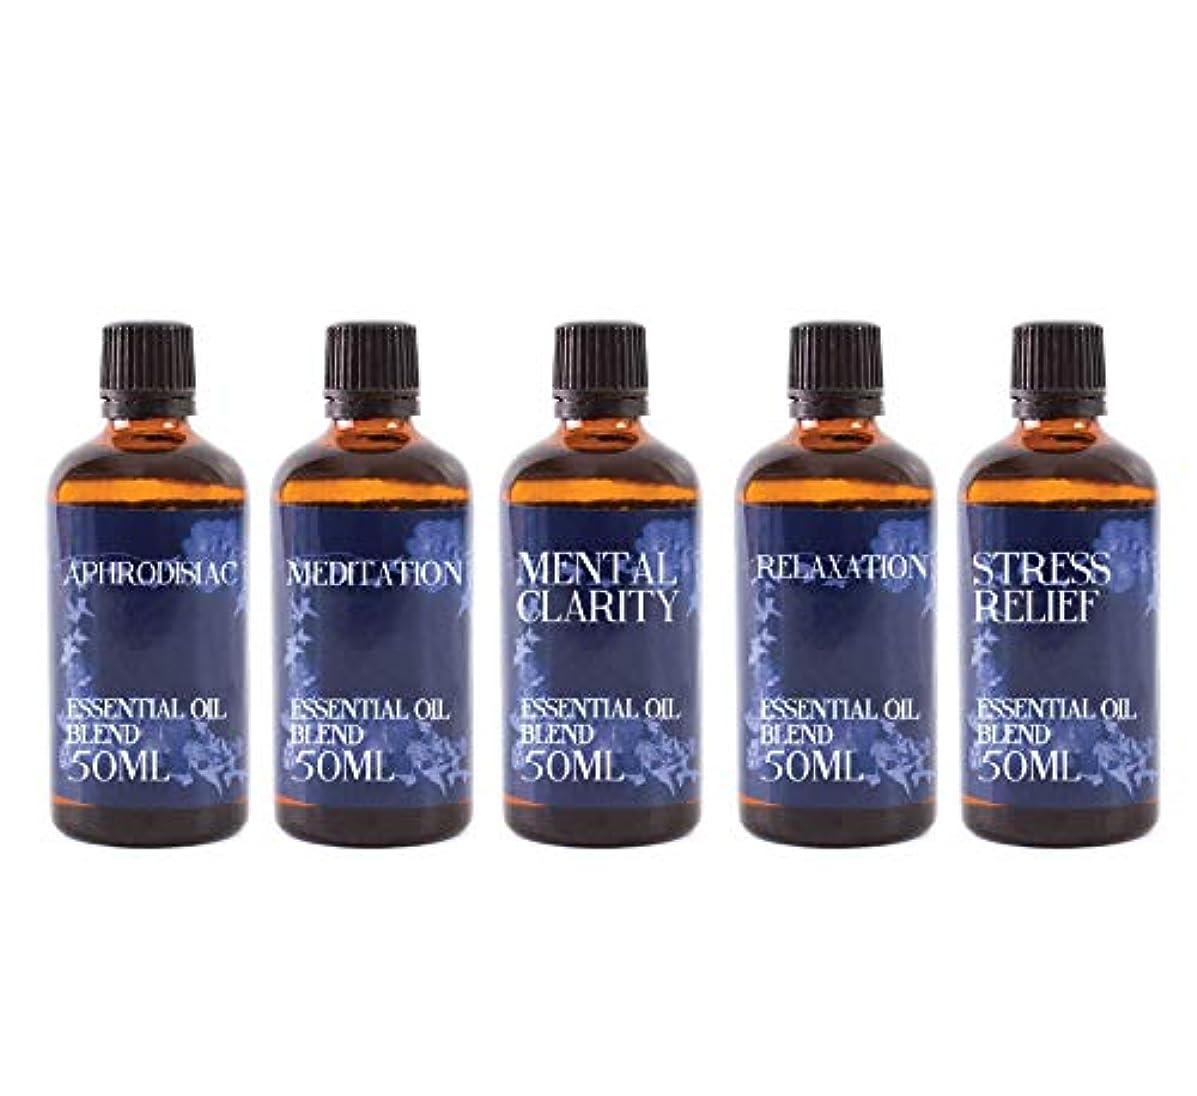 工業用孤児個人Mystix London | Gift Starter Pack of 5 x 50ml - Modern Day Remedies - Essential Oil Blends